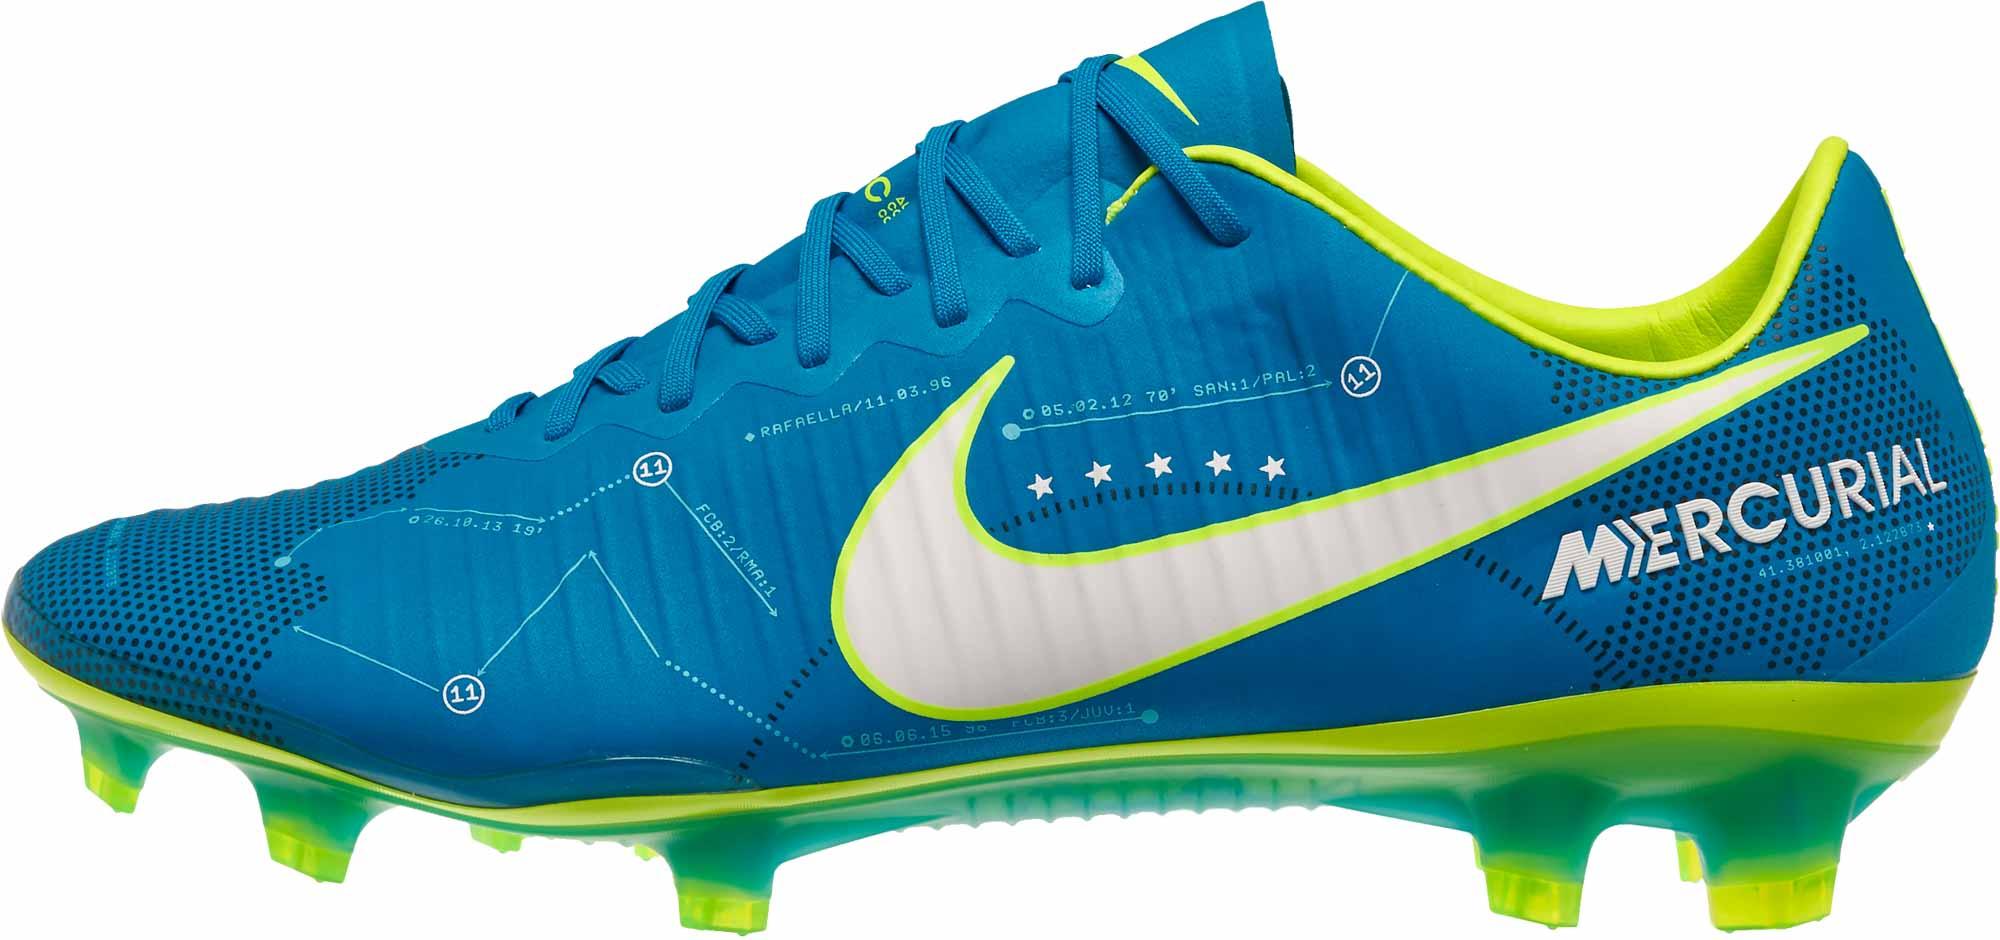 880a22c2b Home   Shop By Brand   Nike Soccer   Nike Soccer Shoes   Nike Mercurial ...